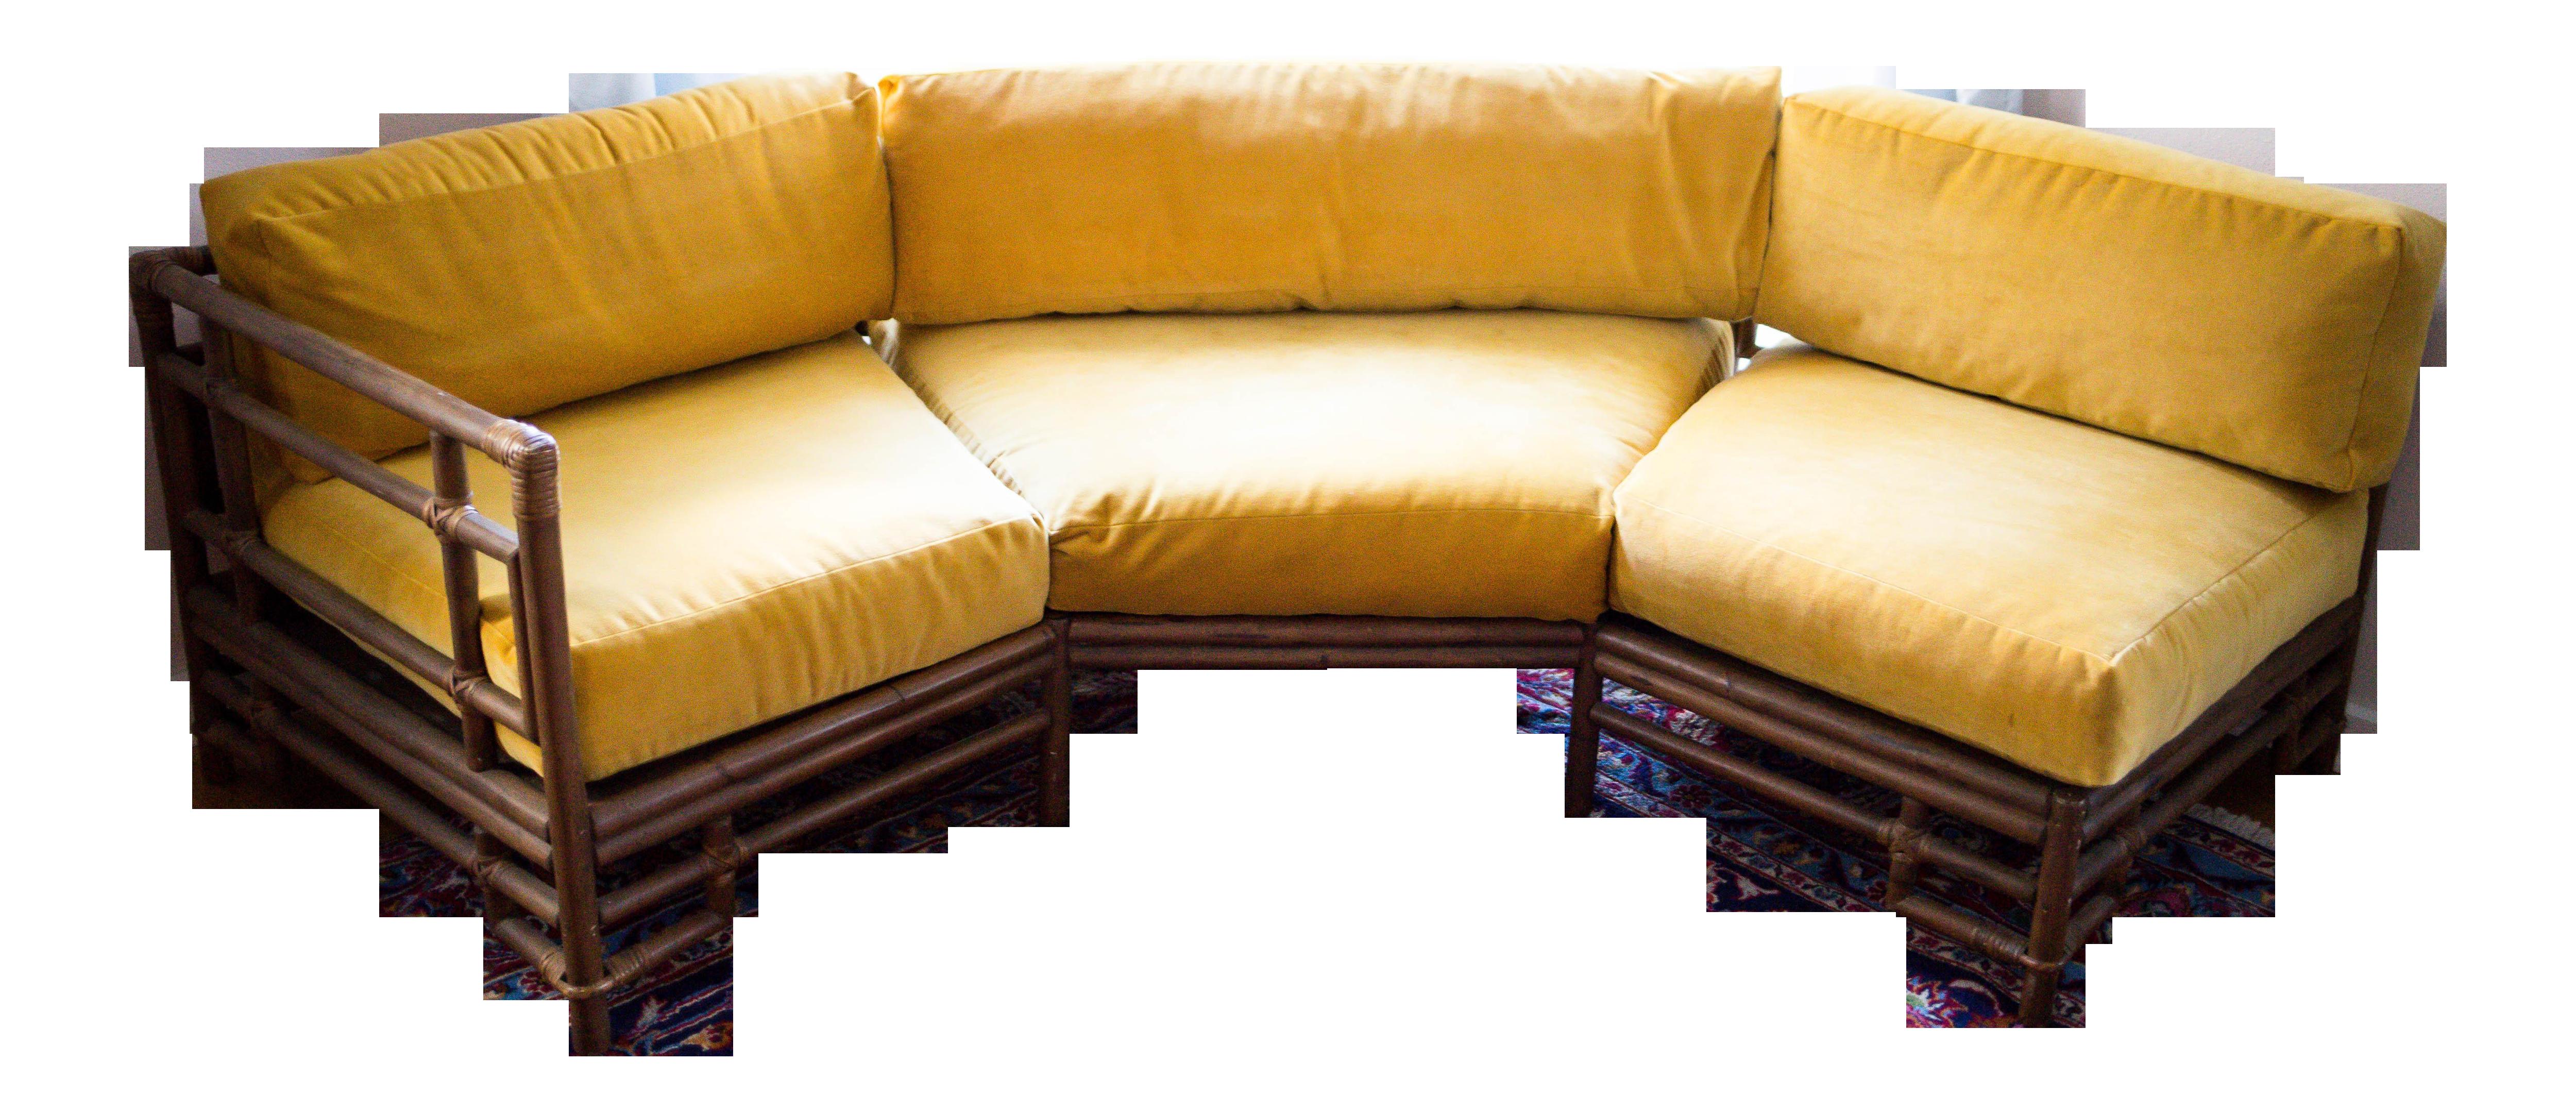 Bamboo furniture prices - Ficks Reed Mustard Velvet Bamboo Sectional